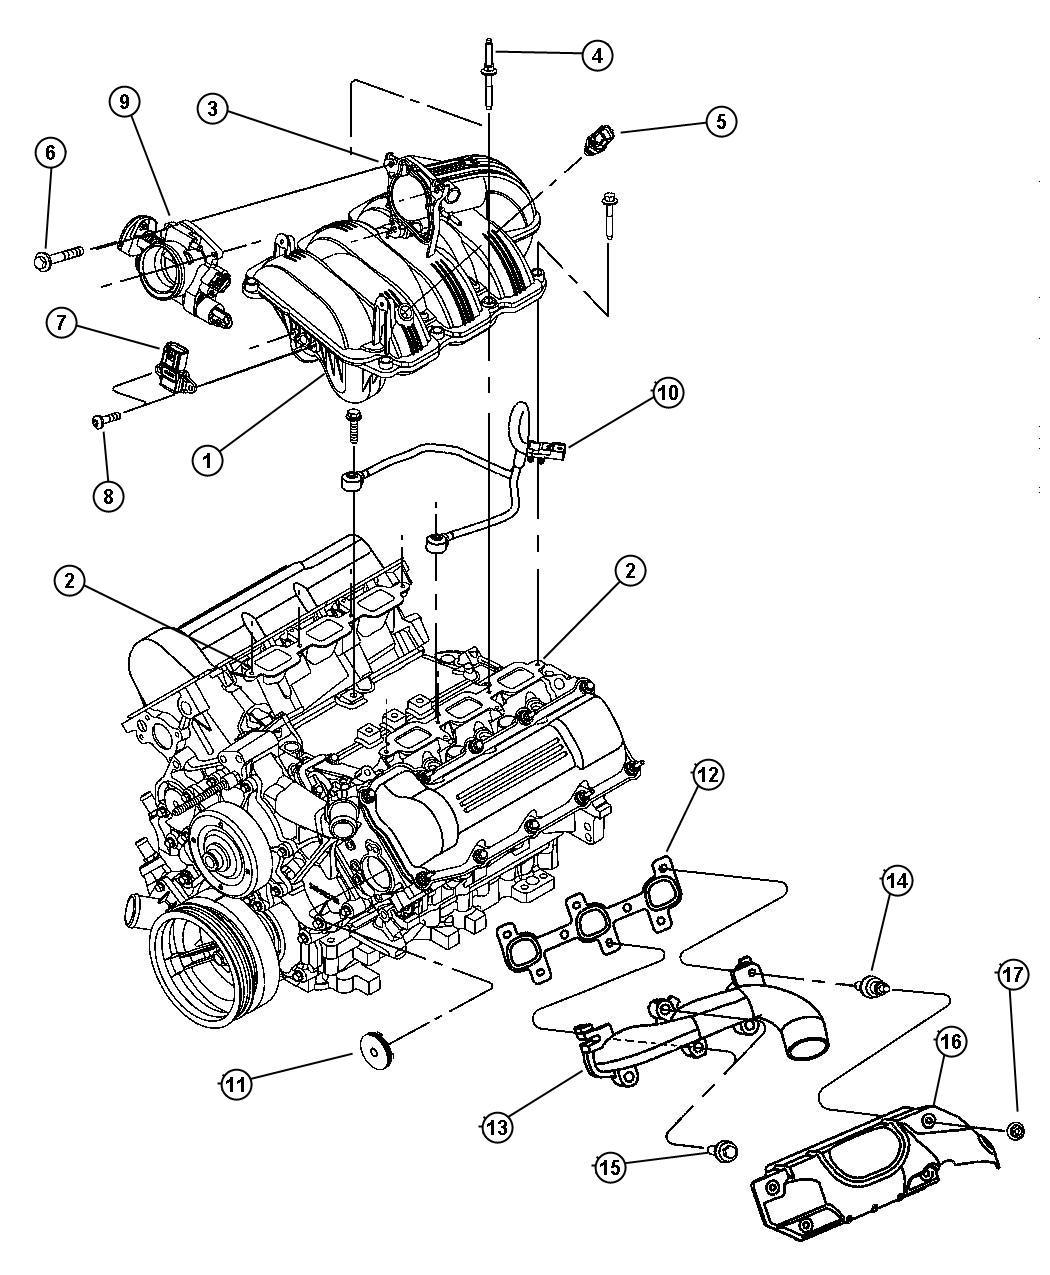 Jeep Commander Throttle Body Compoants